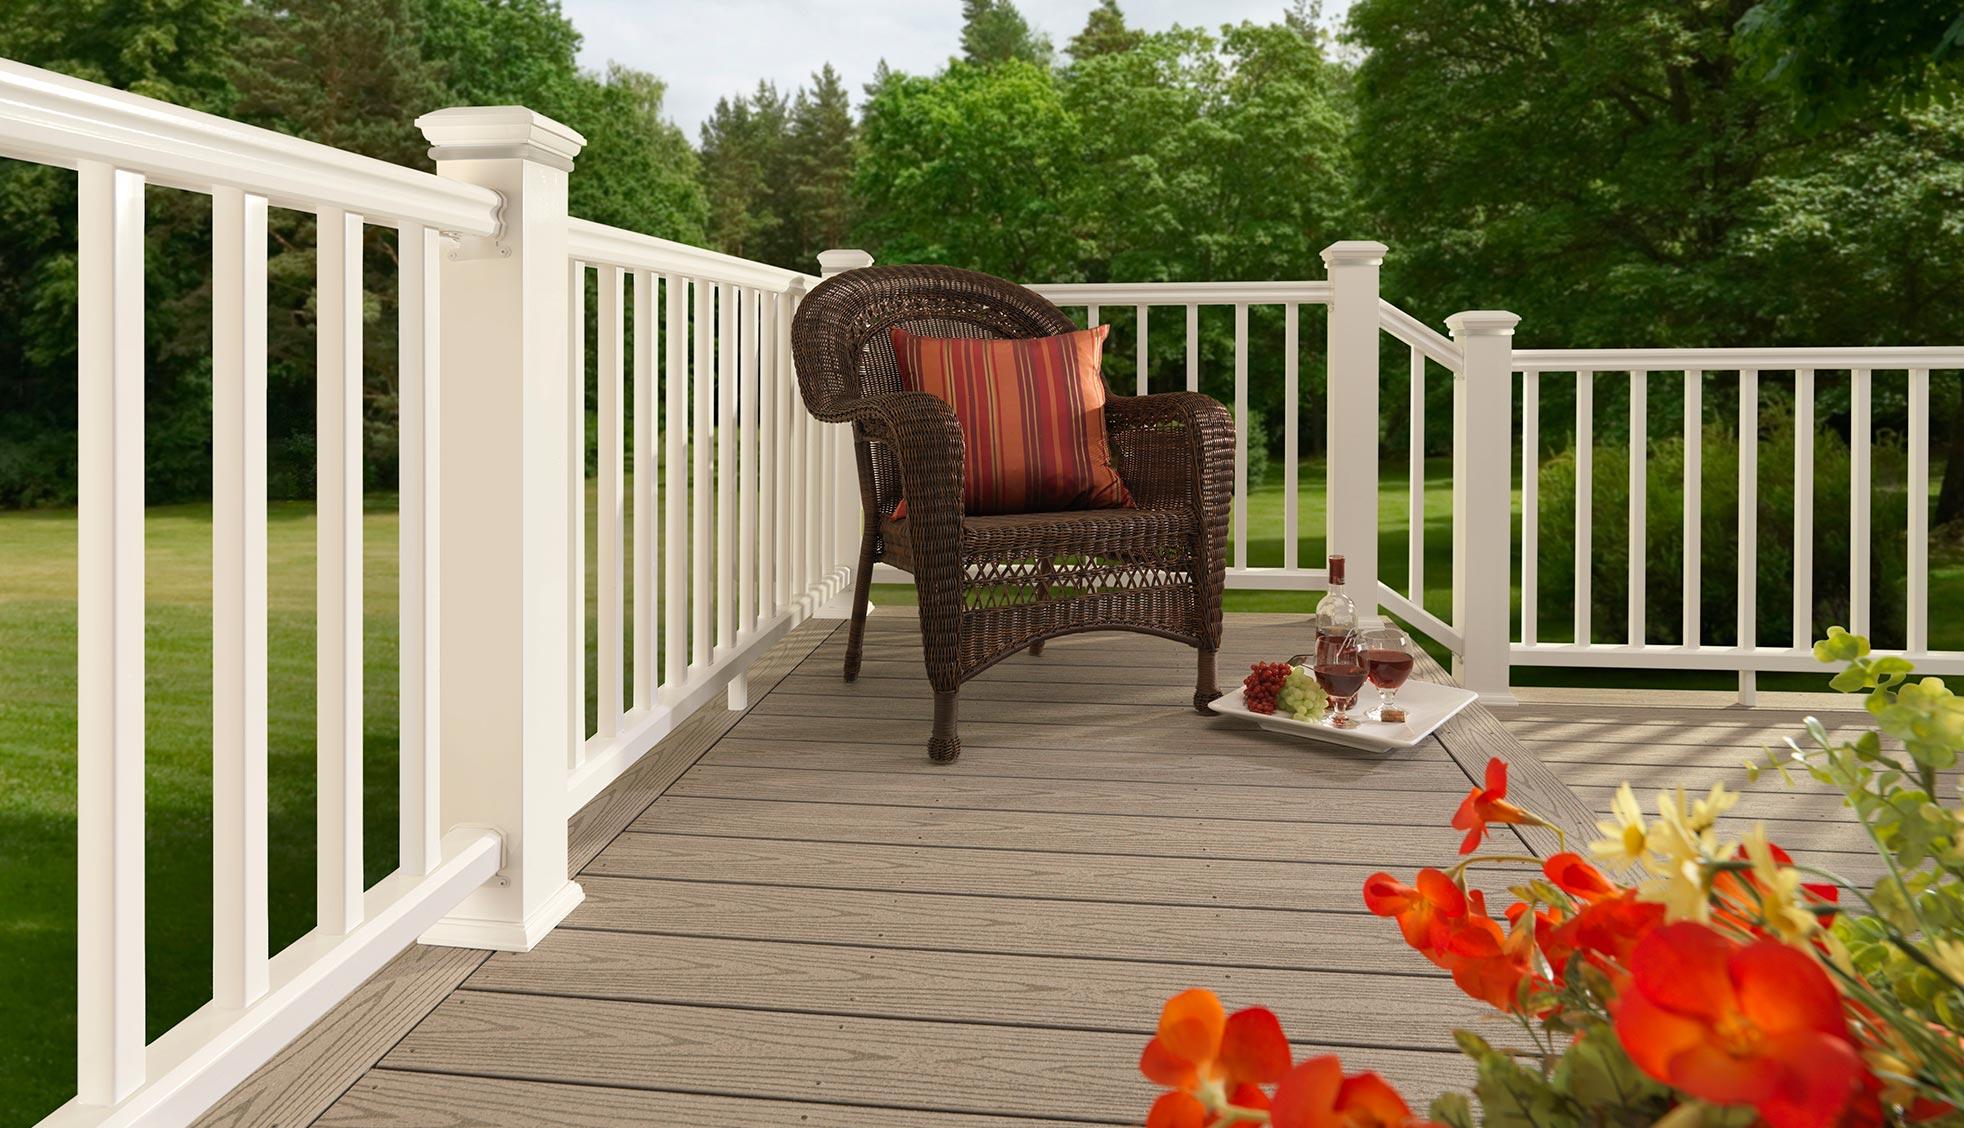 Collection de terrasses ReliaBoard de TimberTech de couleur Gray